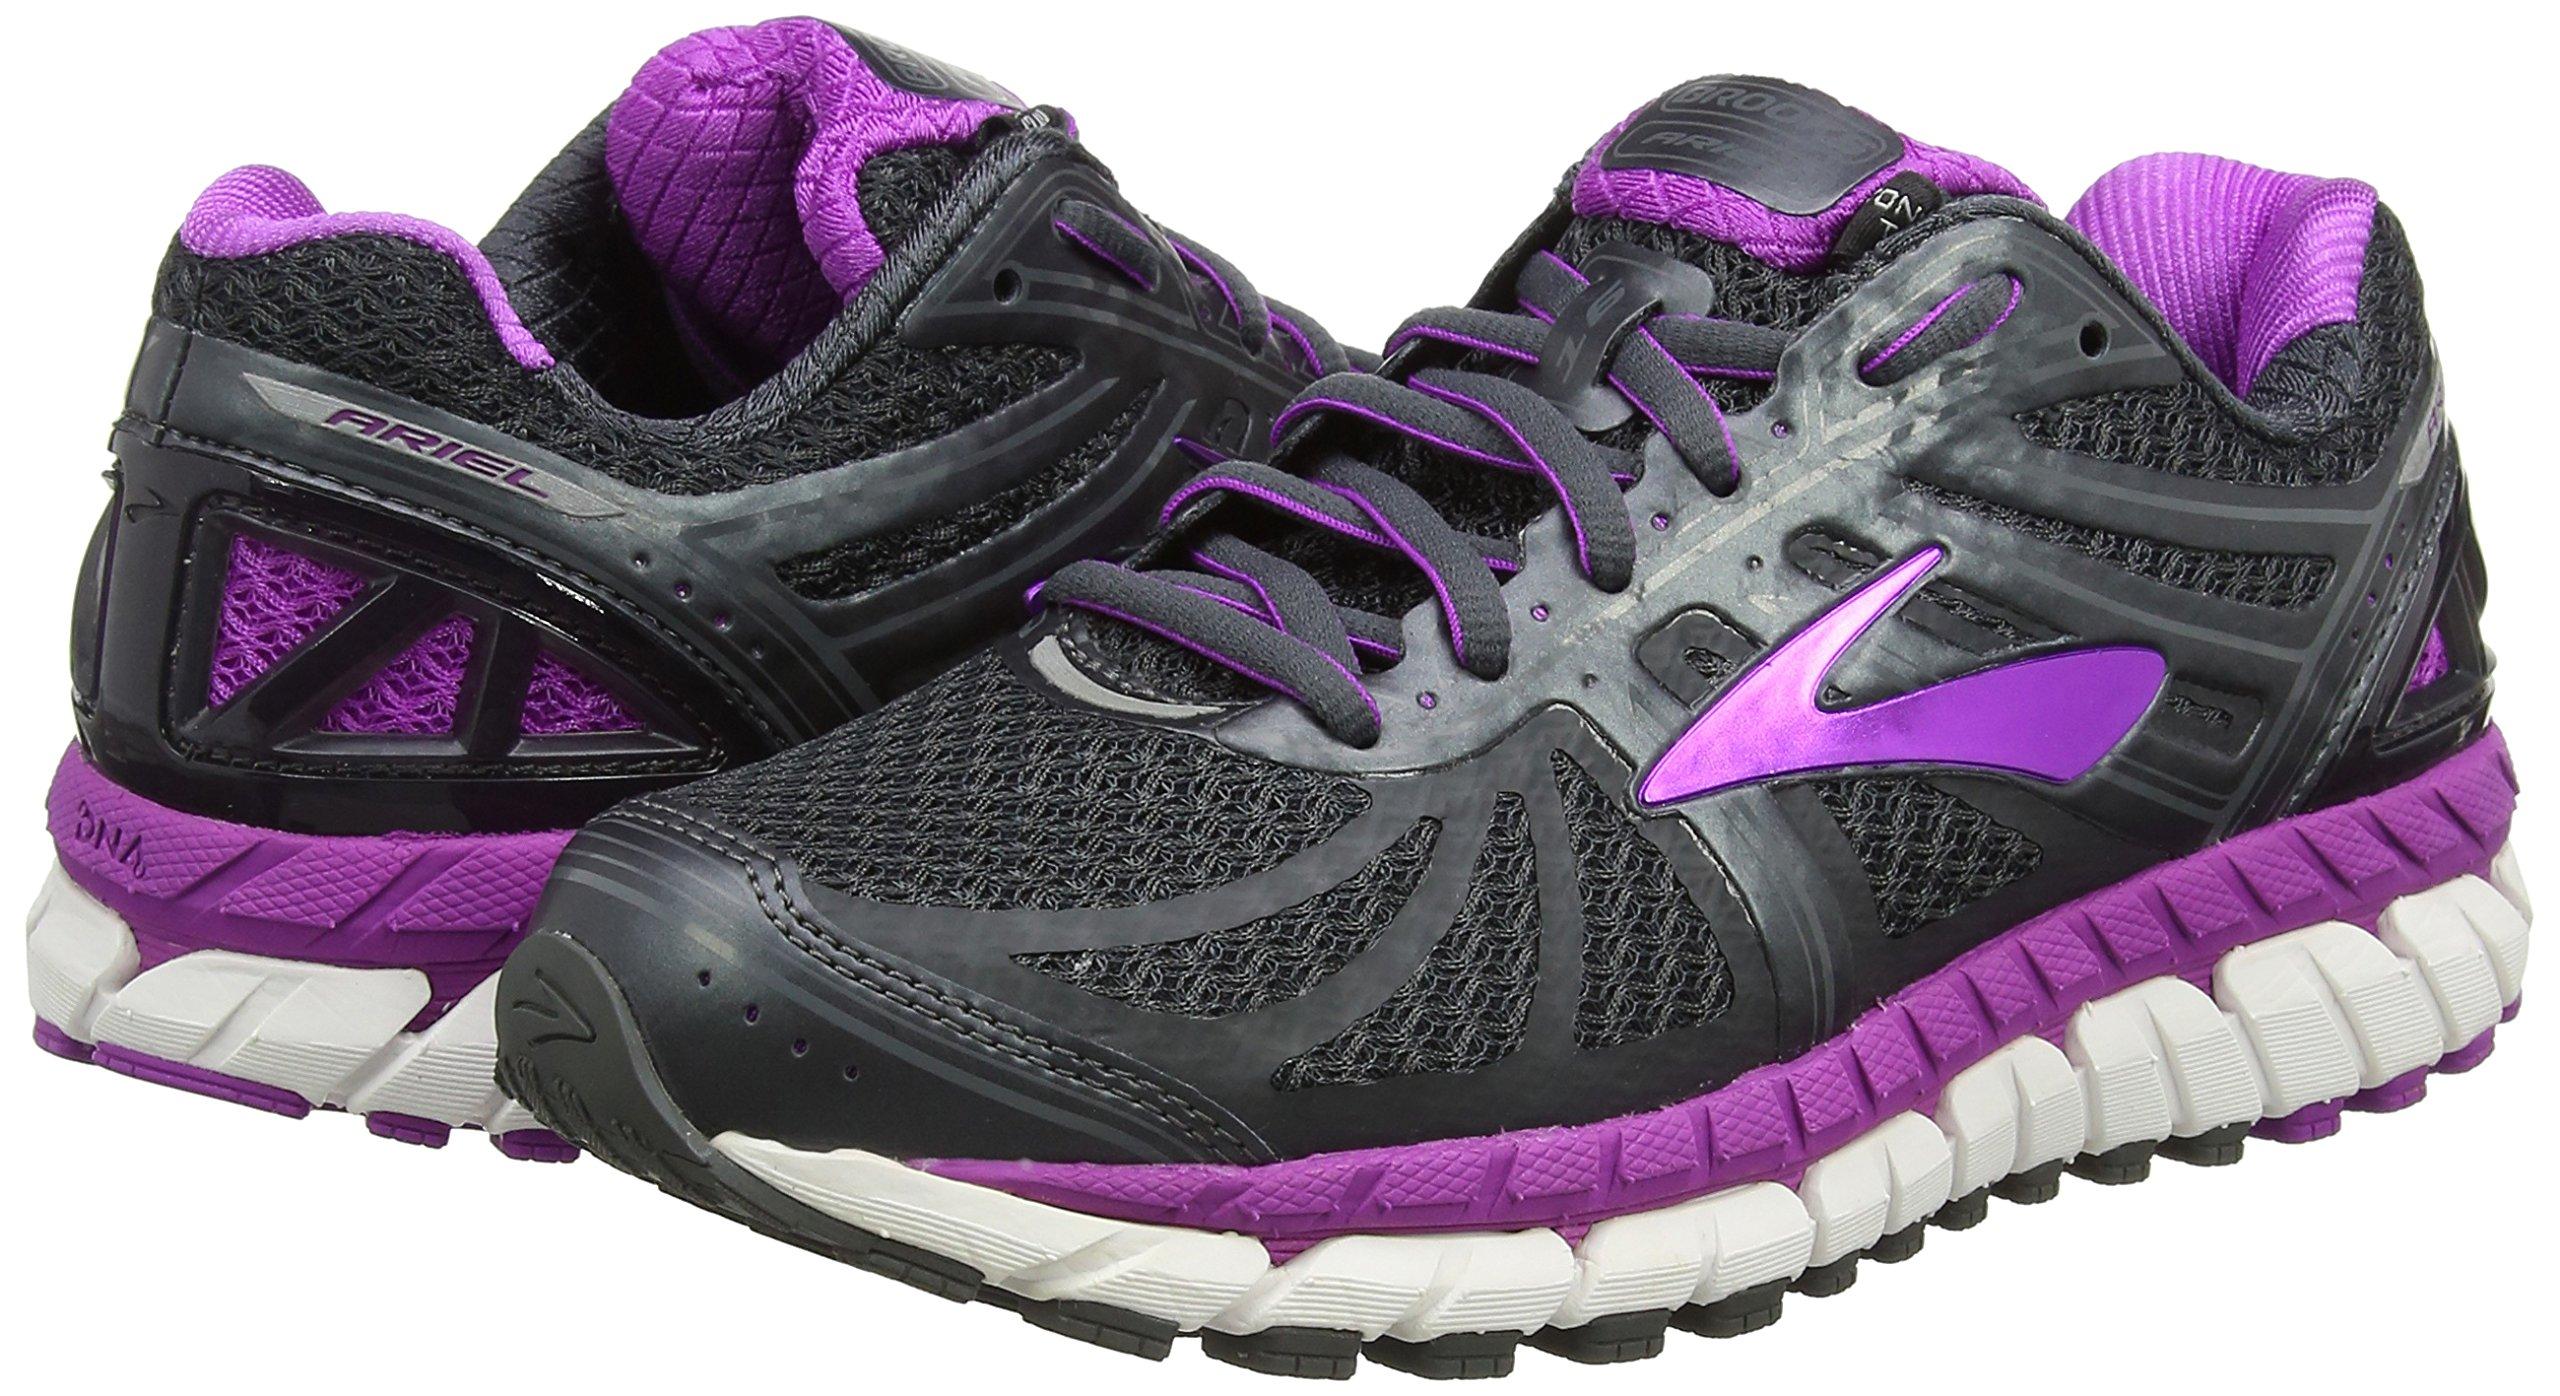 91DqCgrEWHL - Brooks Women's Ariel '16 Running Shoes